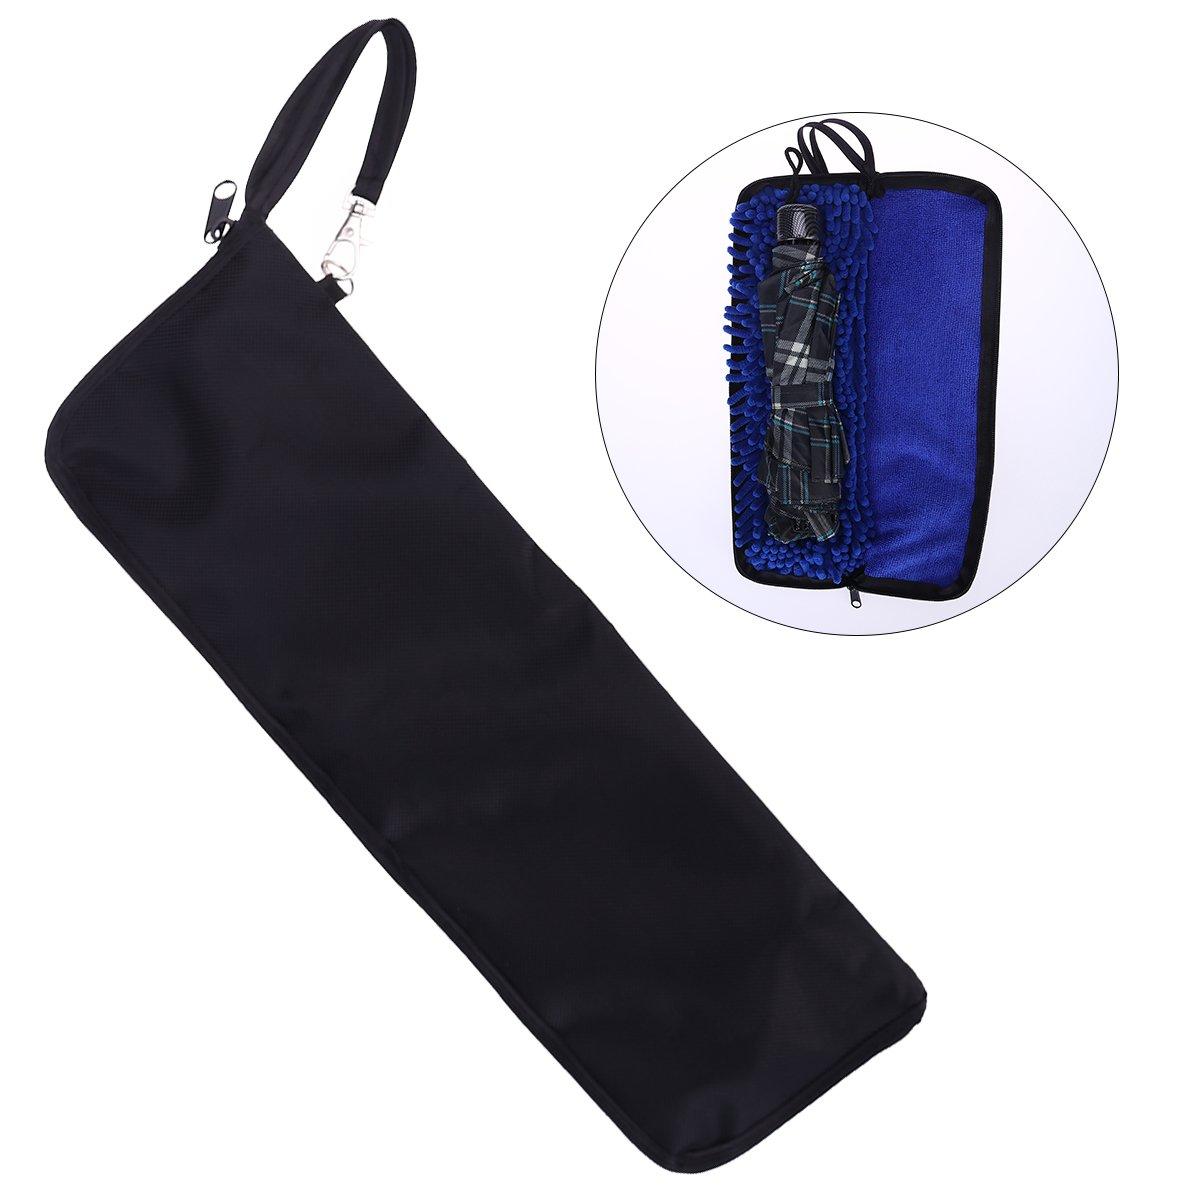 OUNONA Super Water-Absorbent Umbrella Bag Case Zippered Closure Portable Pouch Blue